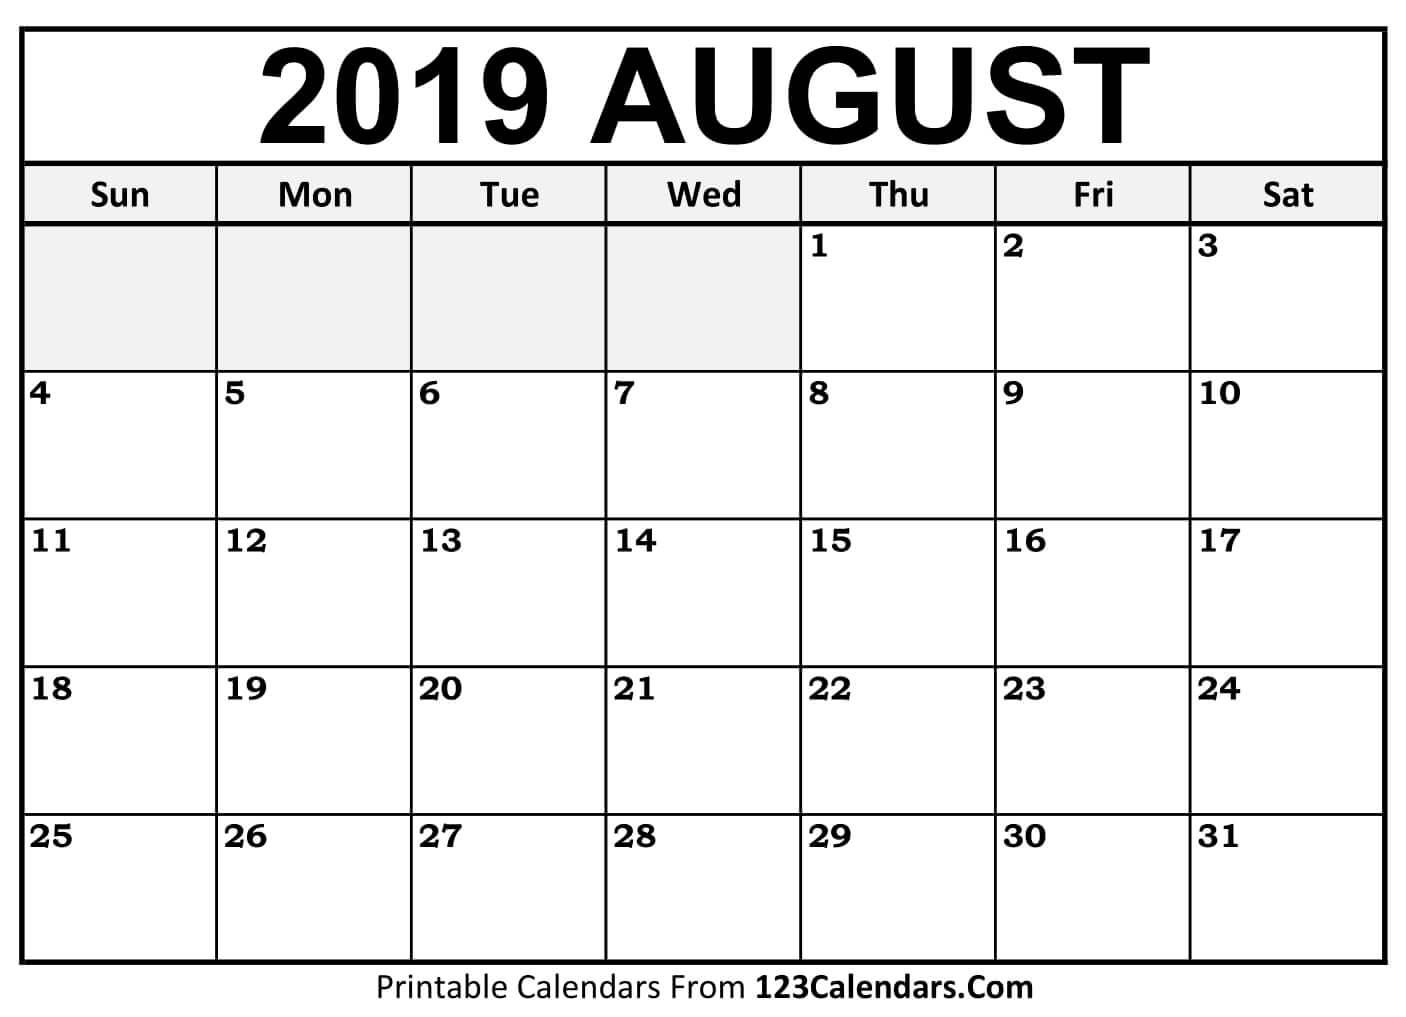 Calendar for August 2019